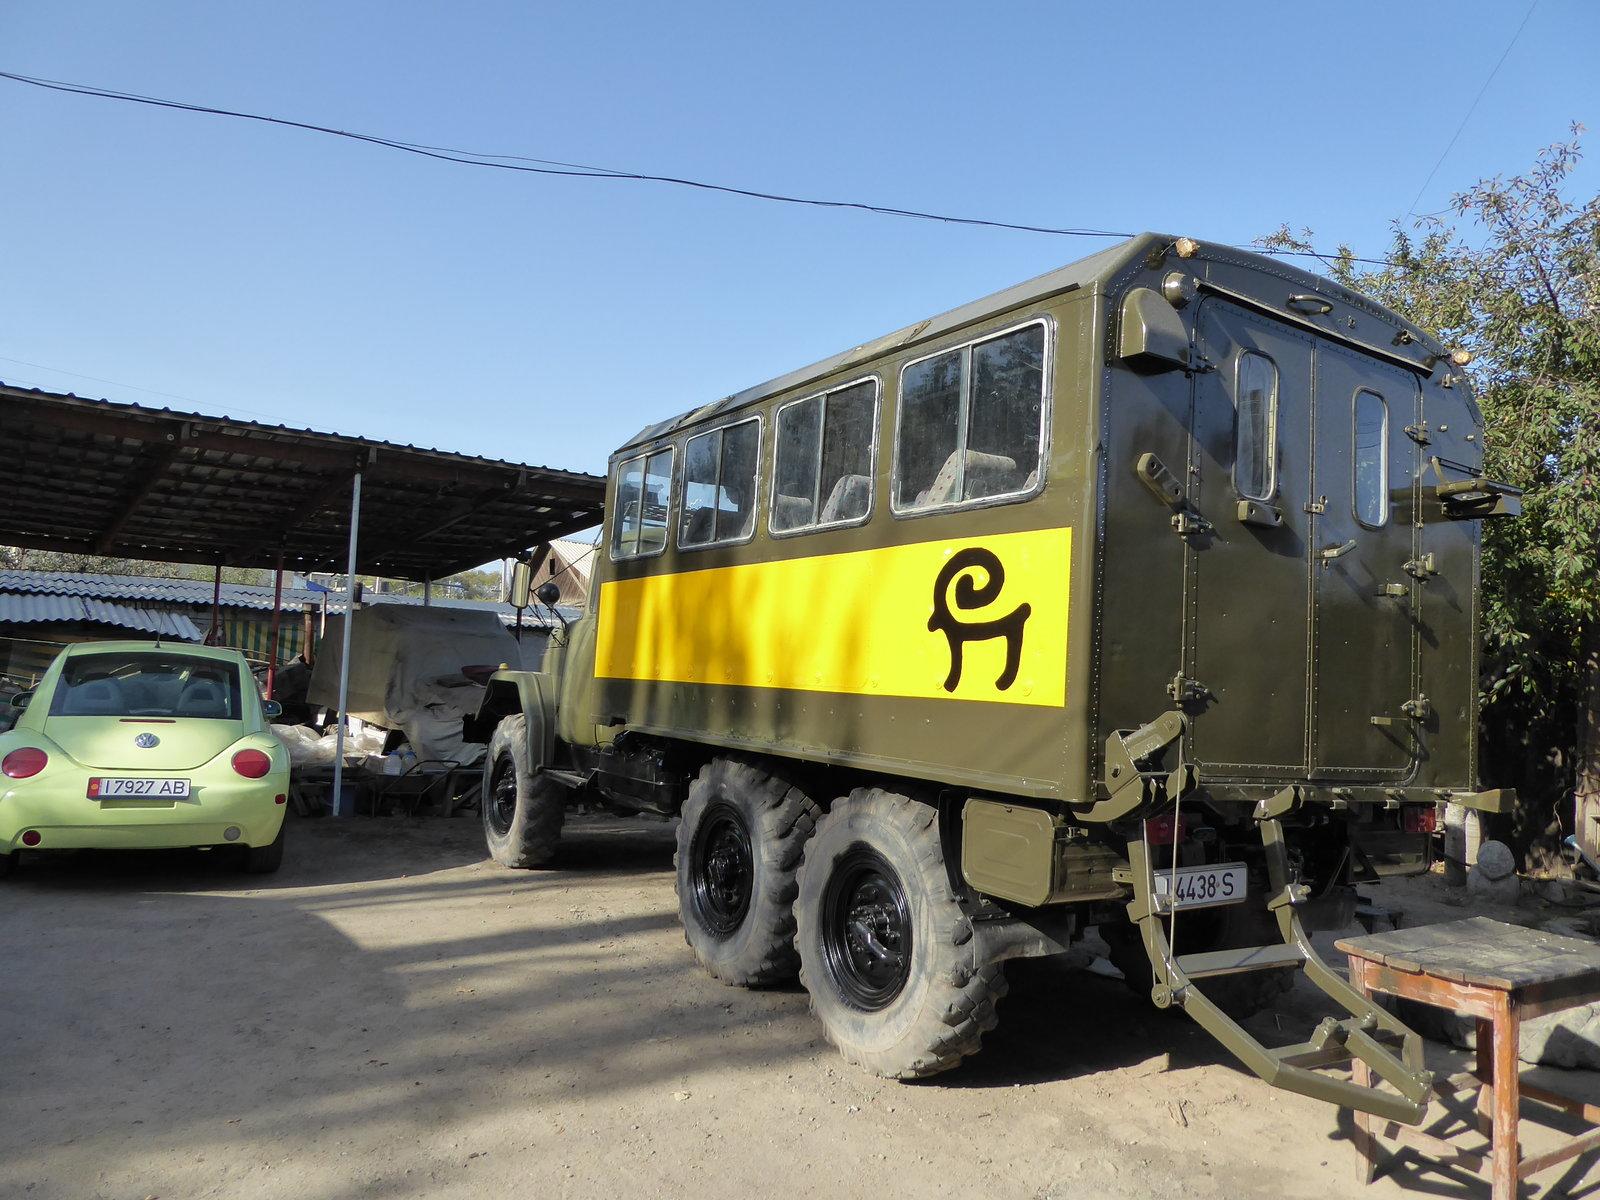 P1000935.JPG